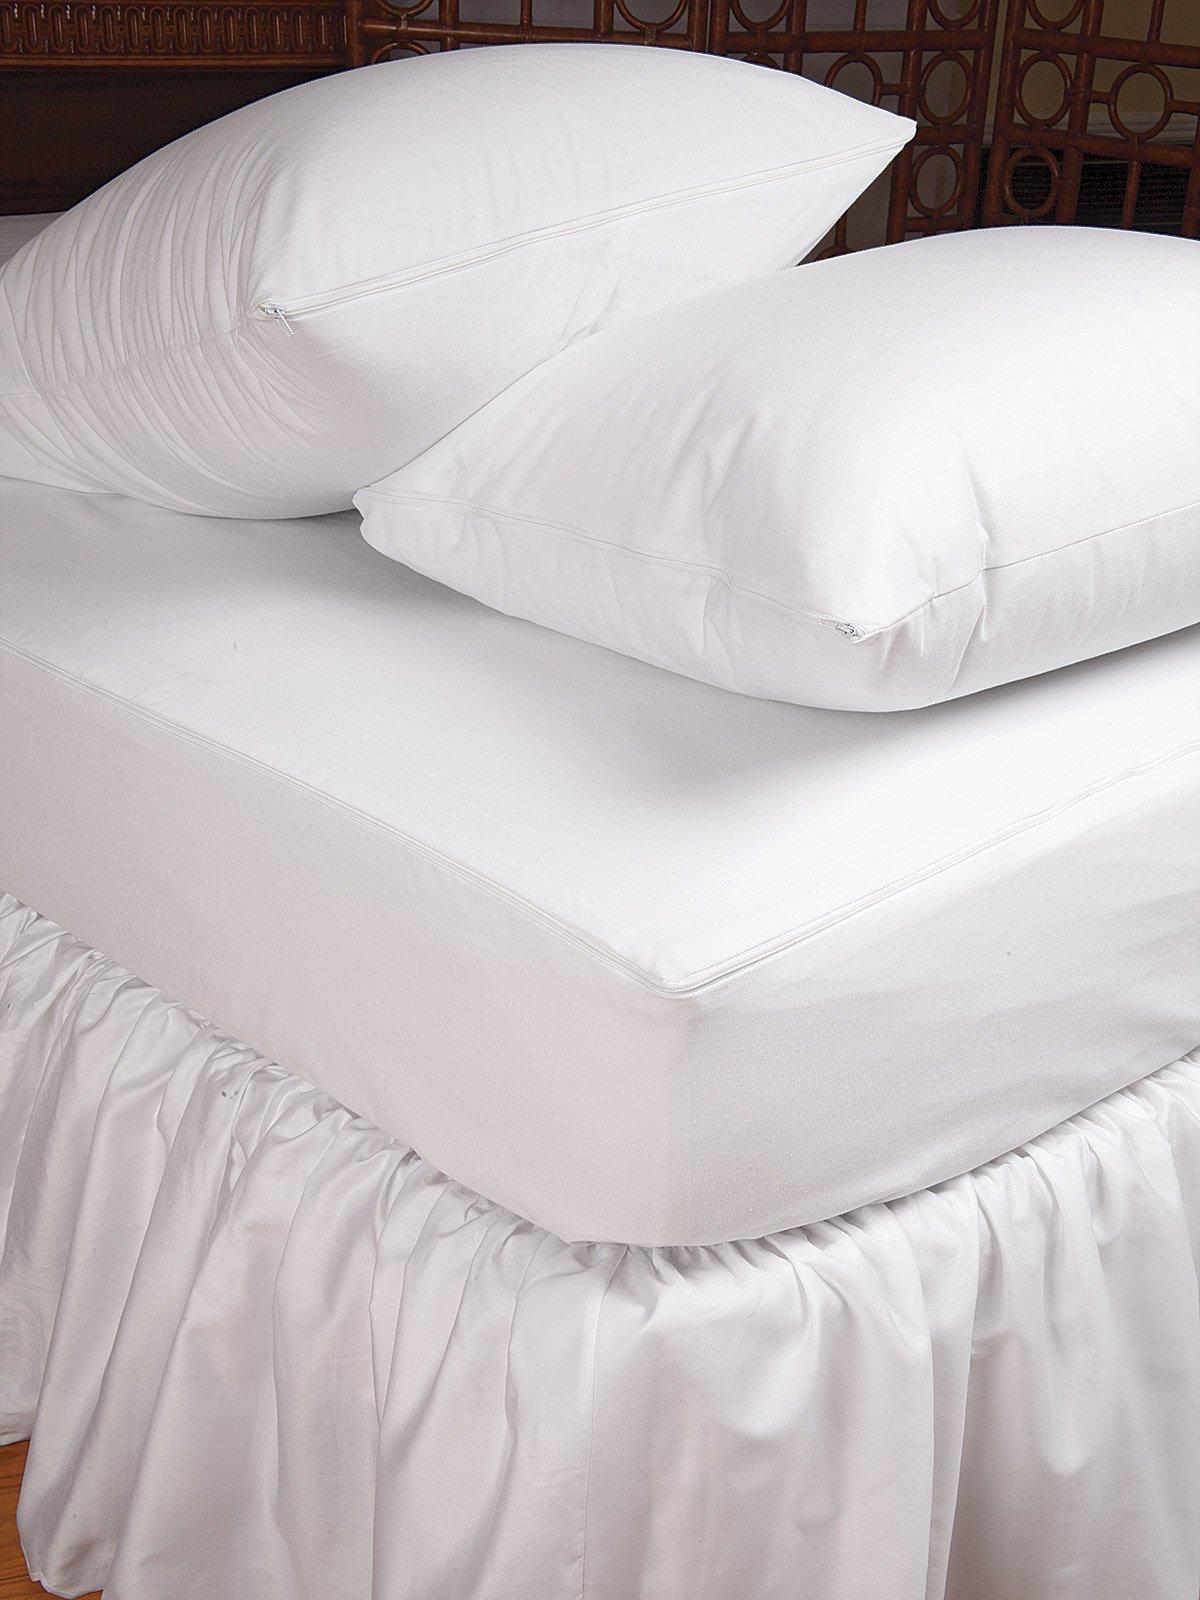 Schweitzer Linen Bed Bug Protectors Mattress Protectors, White (Crib)